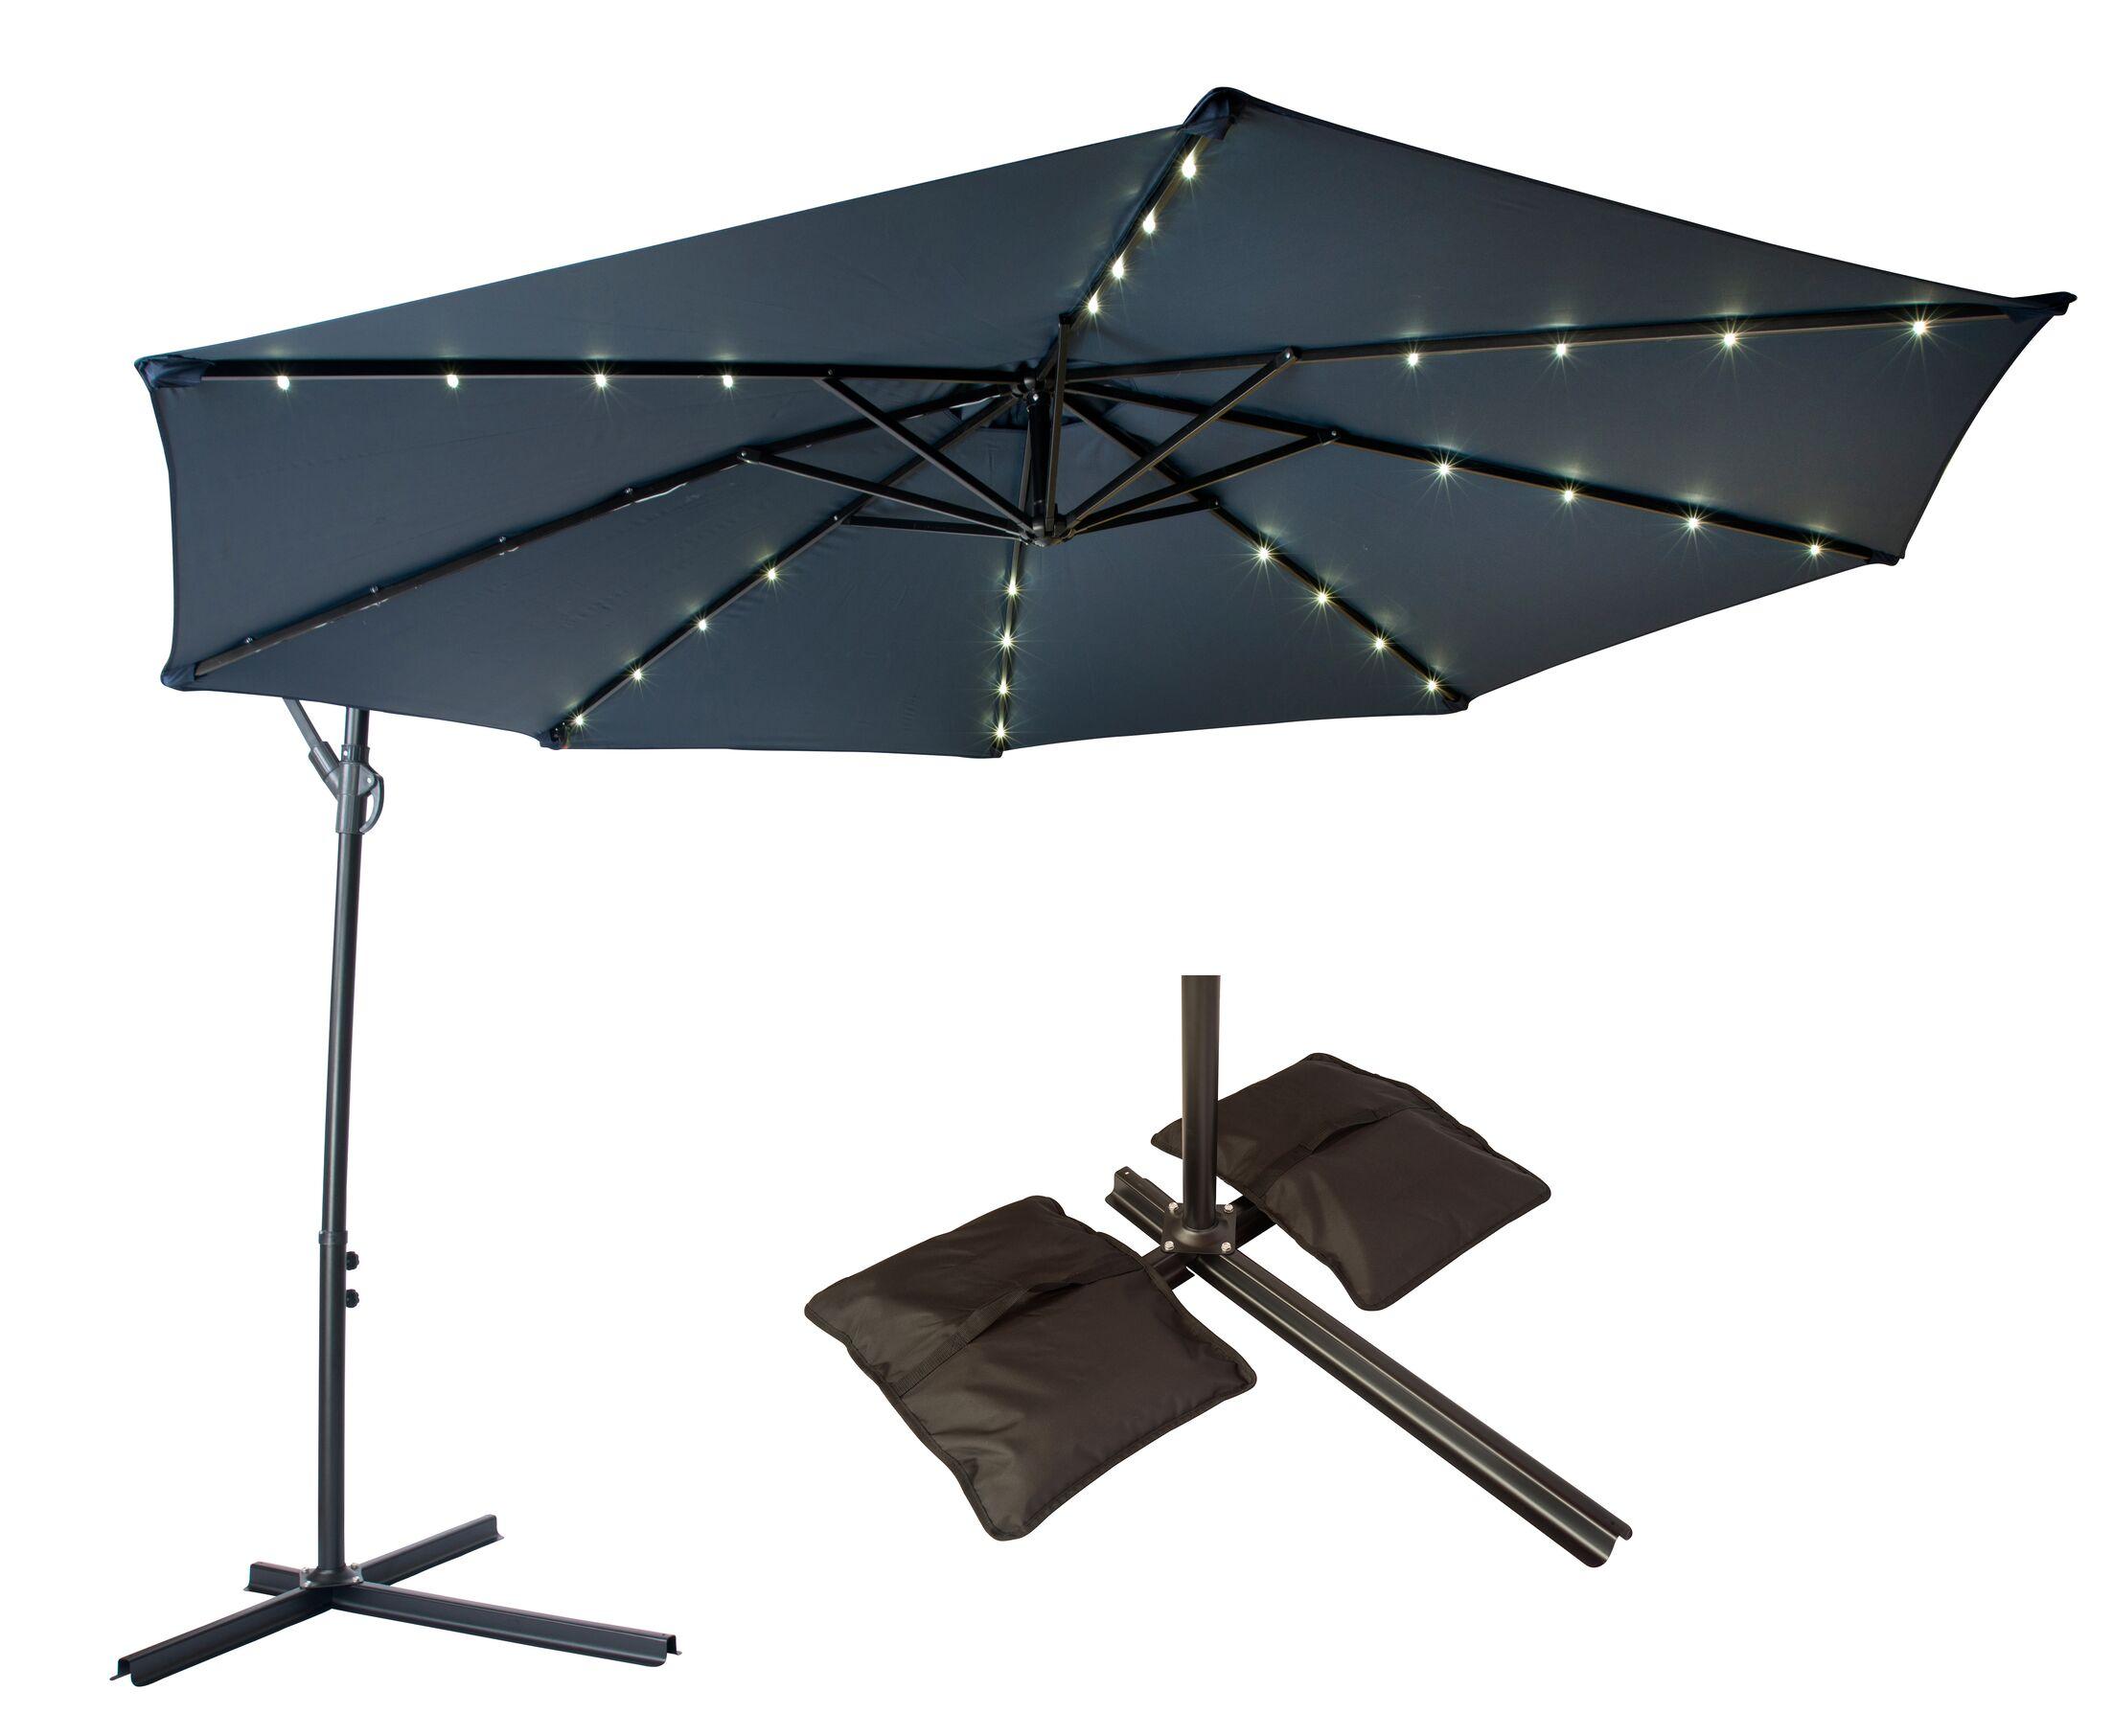 10' Cantilever Umbrella Color: Blue